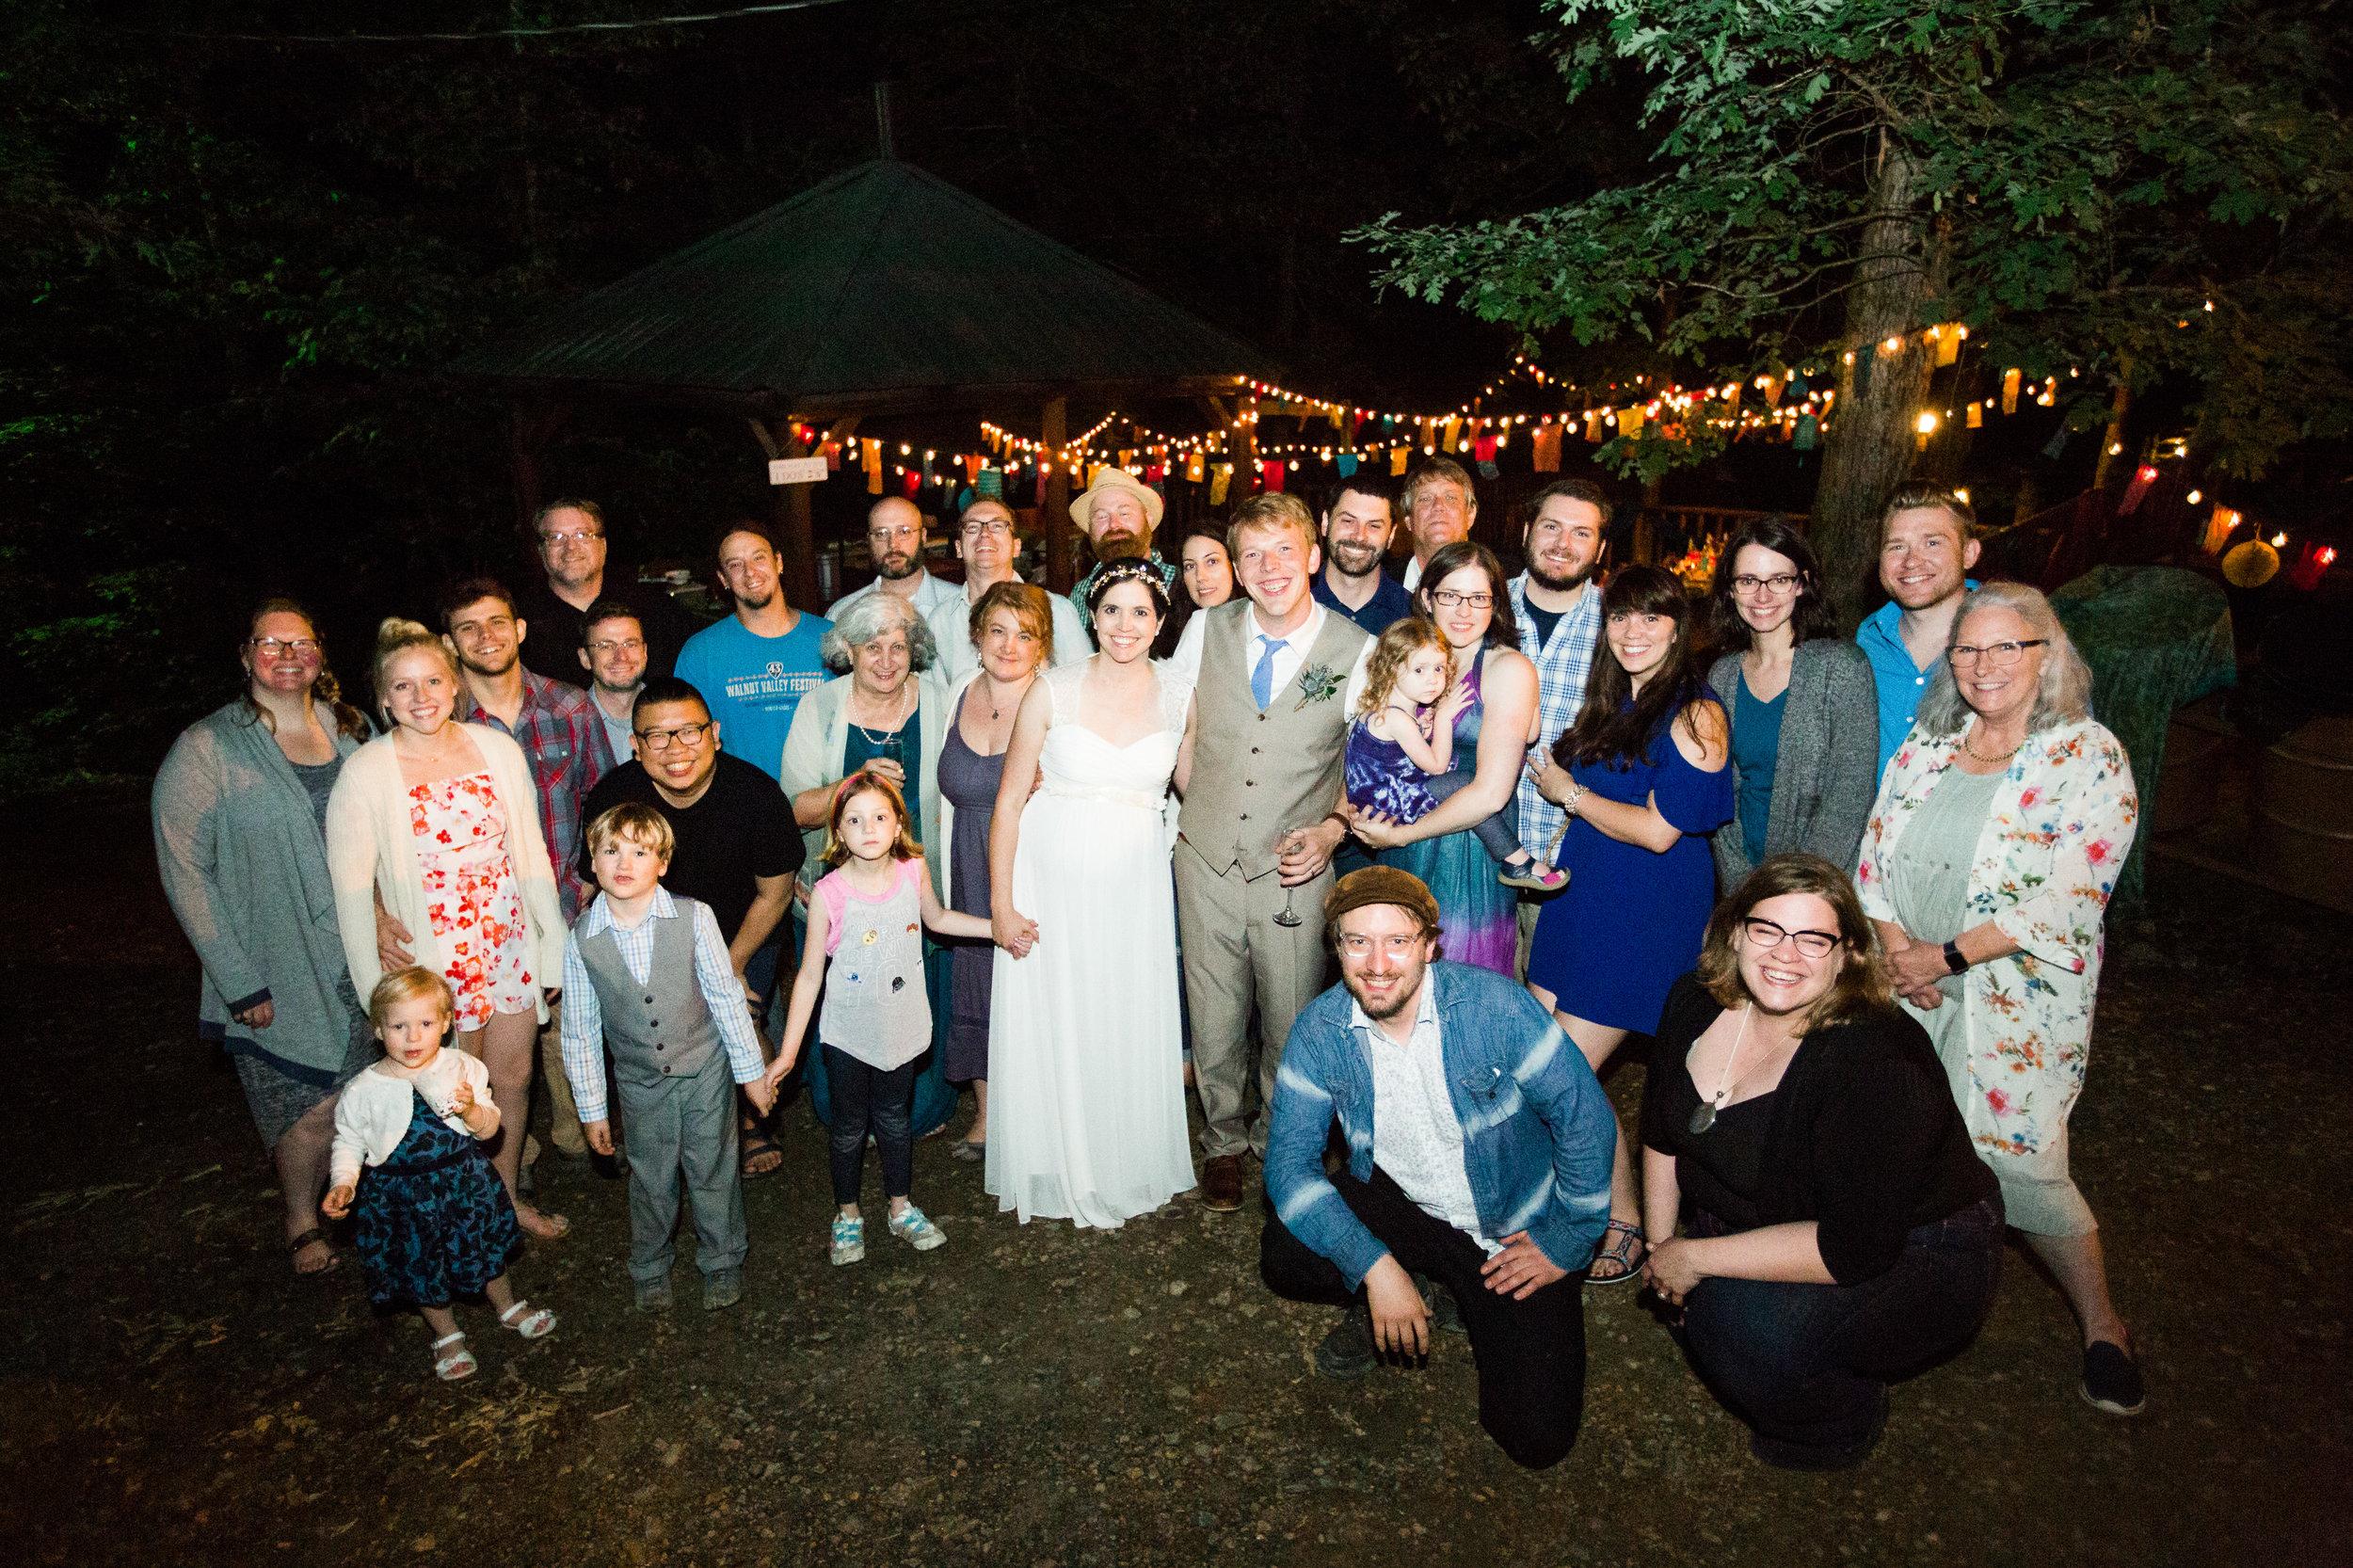 megginson_wedding_app2017-471.jpg